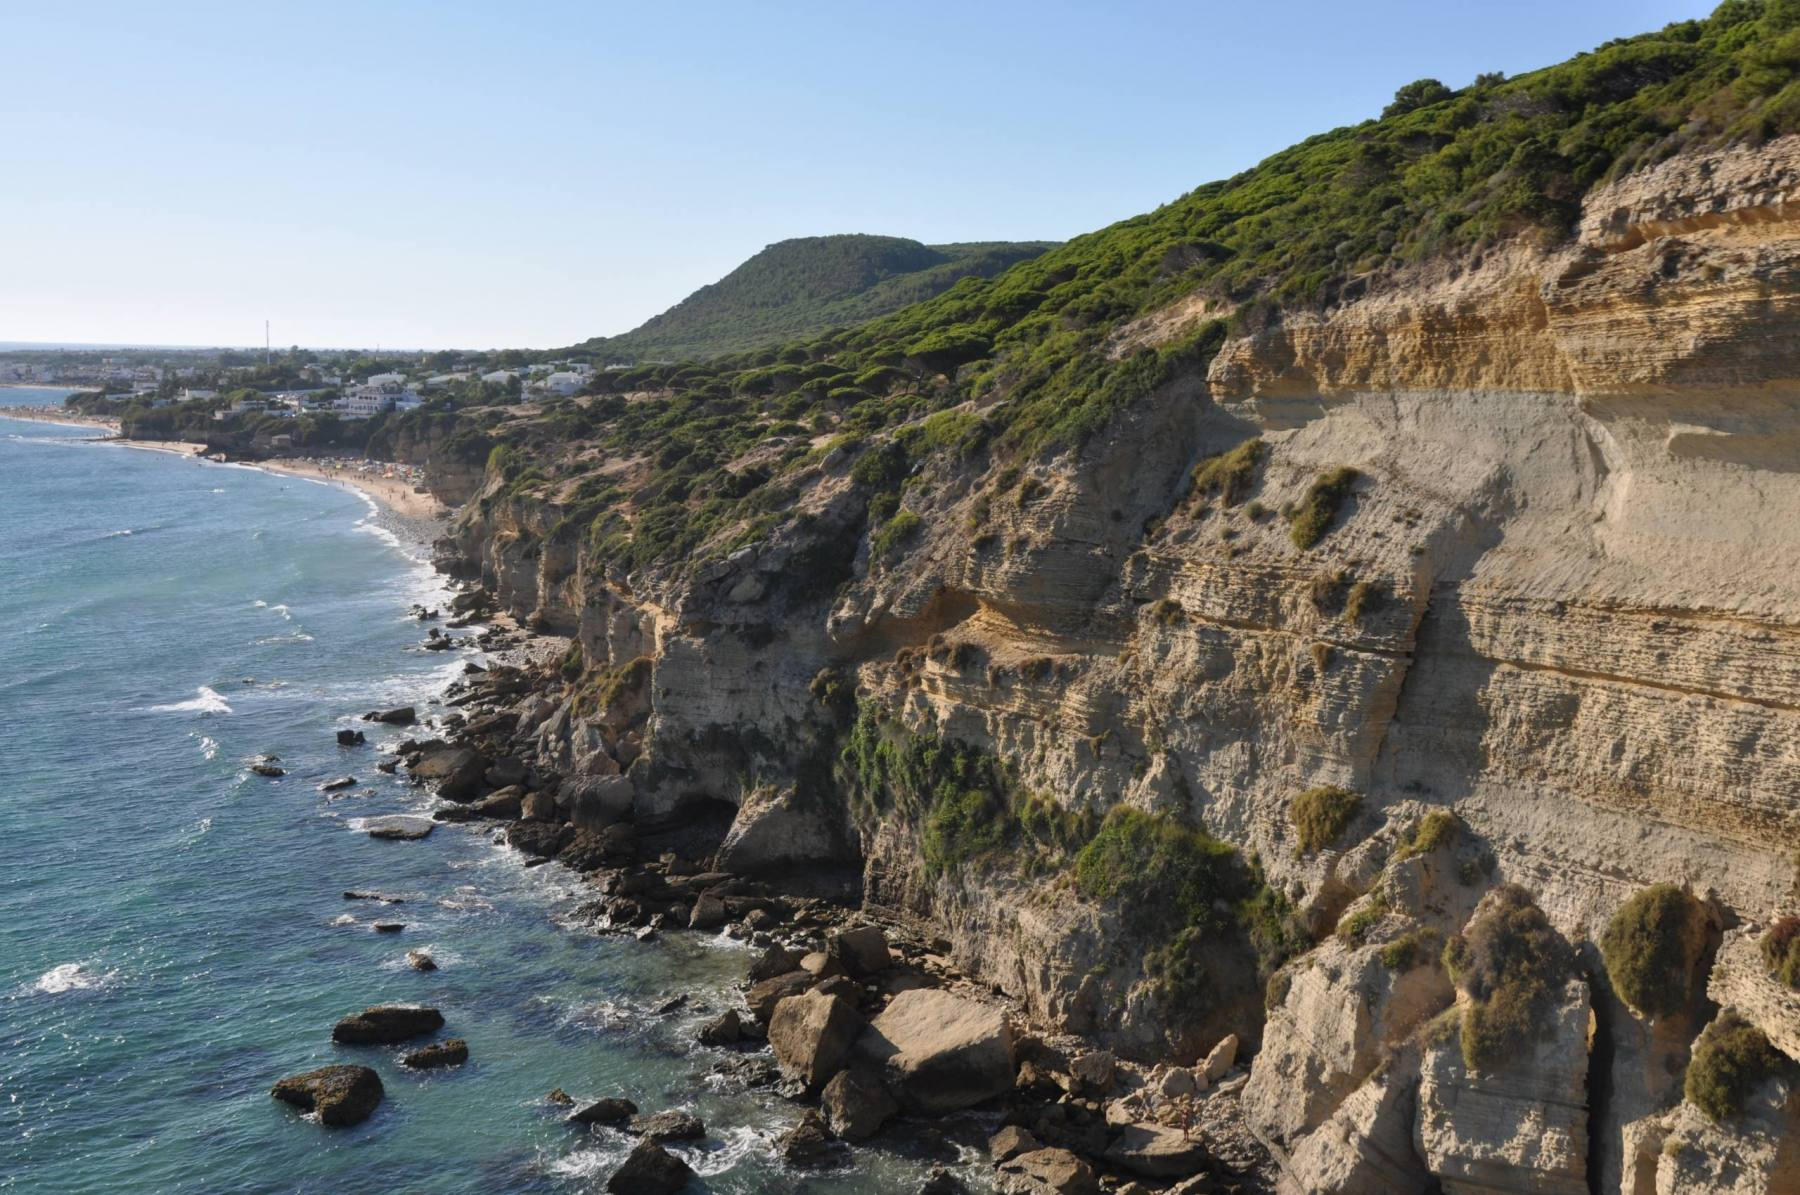 Nudismo Naturismo en Cádiz